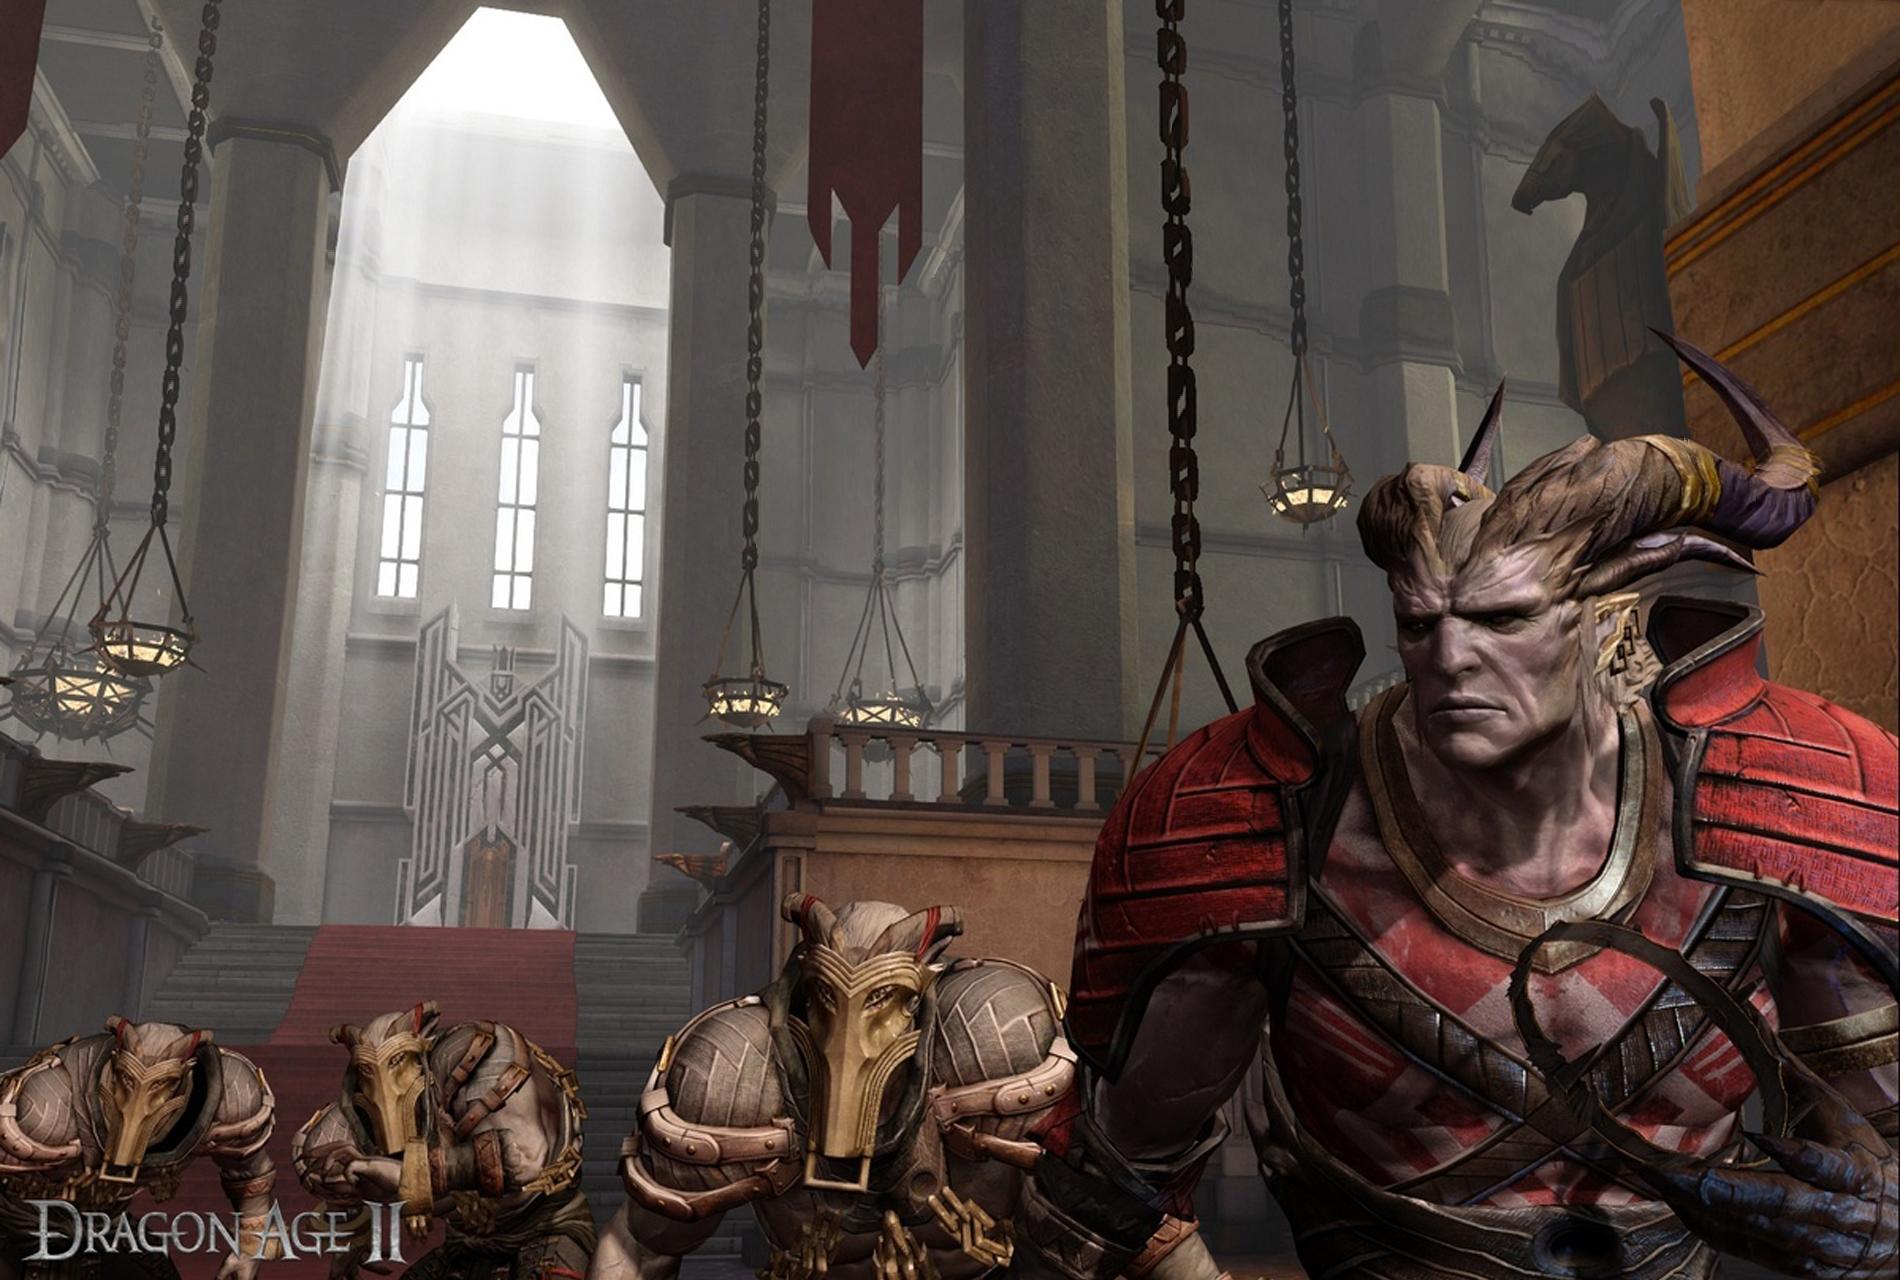 Dragon Age 2 Wallpapers, Dragon Age Origin Wallpapers, Dragon Age Wallpapers, Dragon Age II Wallpapers